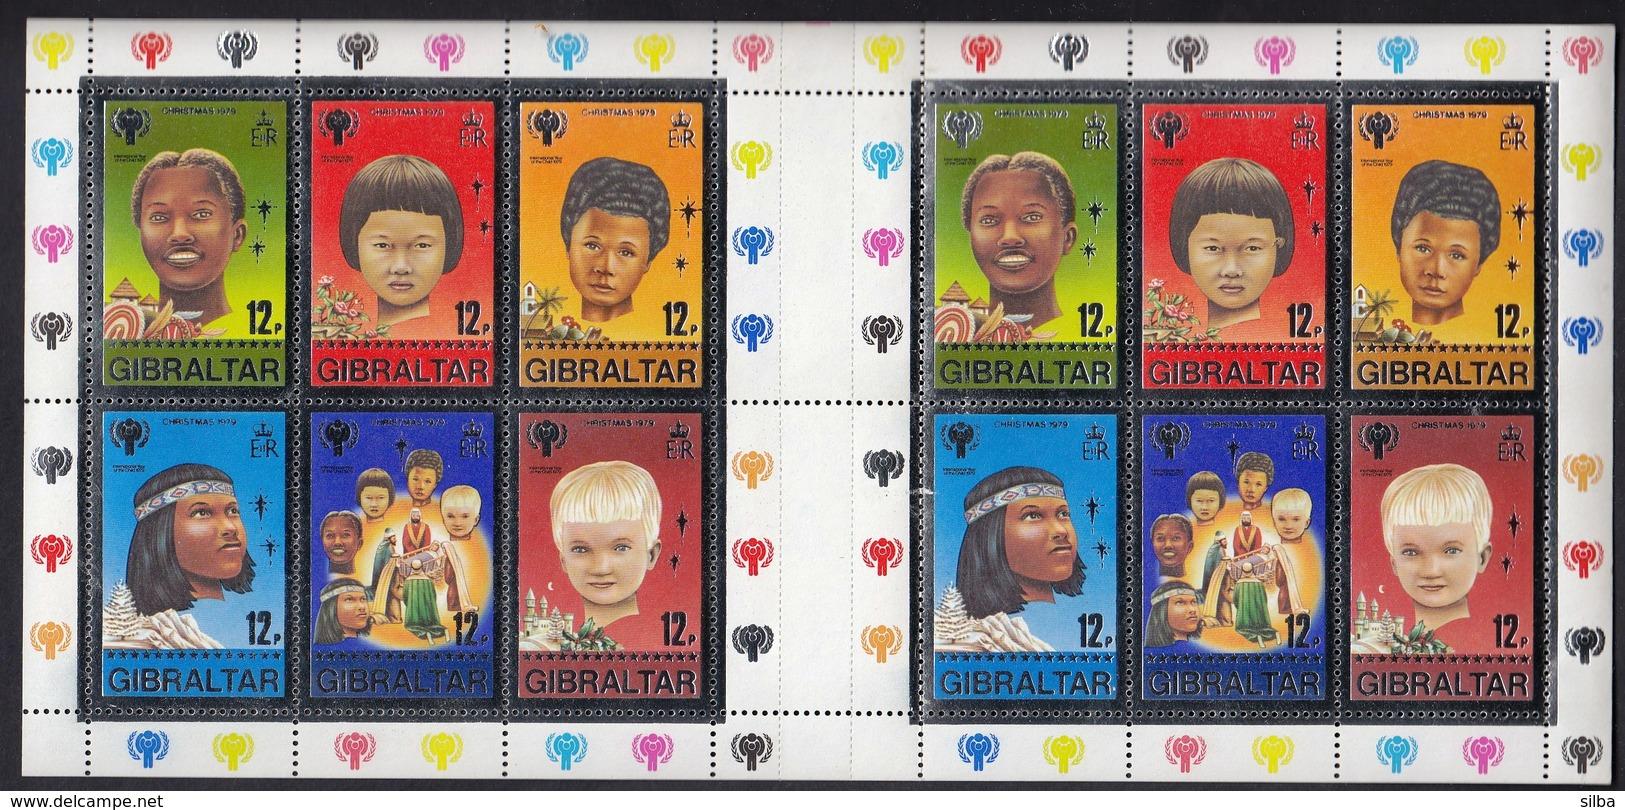 Gibraltar 1979  / Jahr Des Kindes, International Year Of The Child / Mi Bl. 6 / MINT Sheet - Childhood & Youth